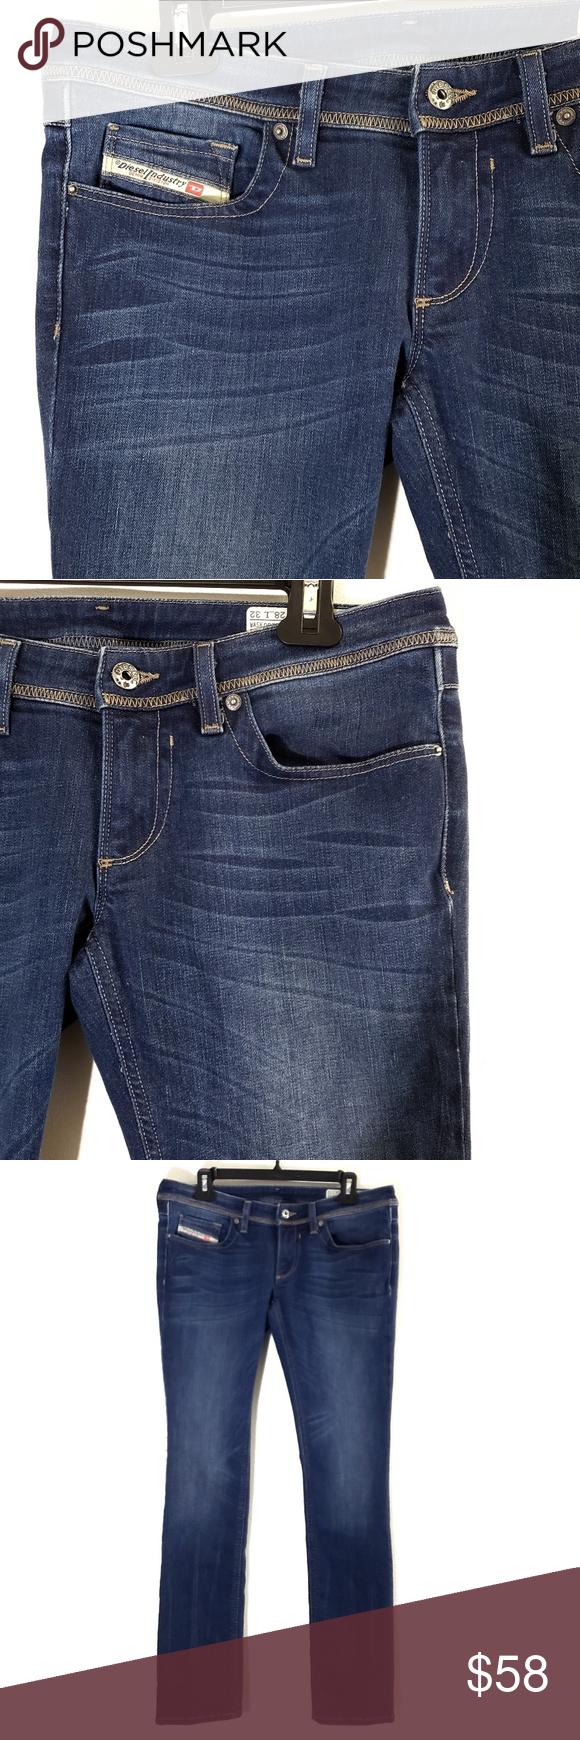 811d894f Diesel Lowky Regular Straight Low Waste Jeans Diesel Industry Lowky jeans  in excellent condition. Regular straight, low waist, stretch, wash ORZ61.